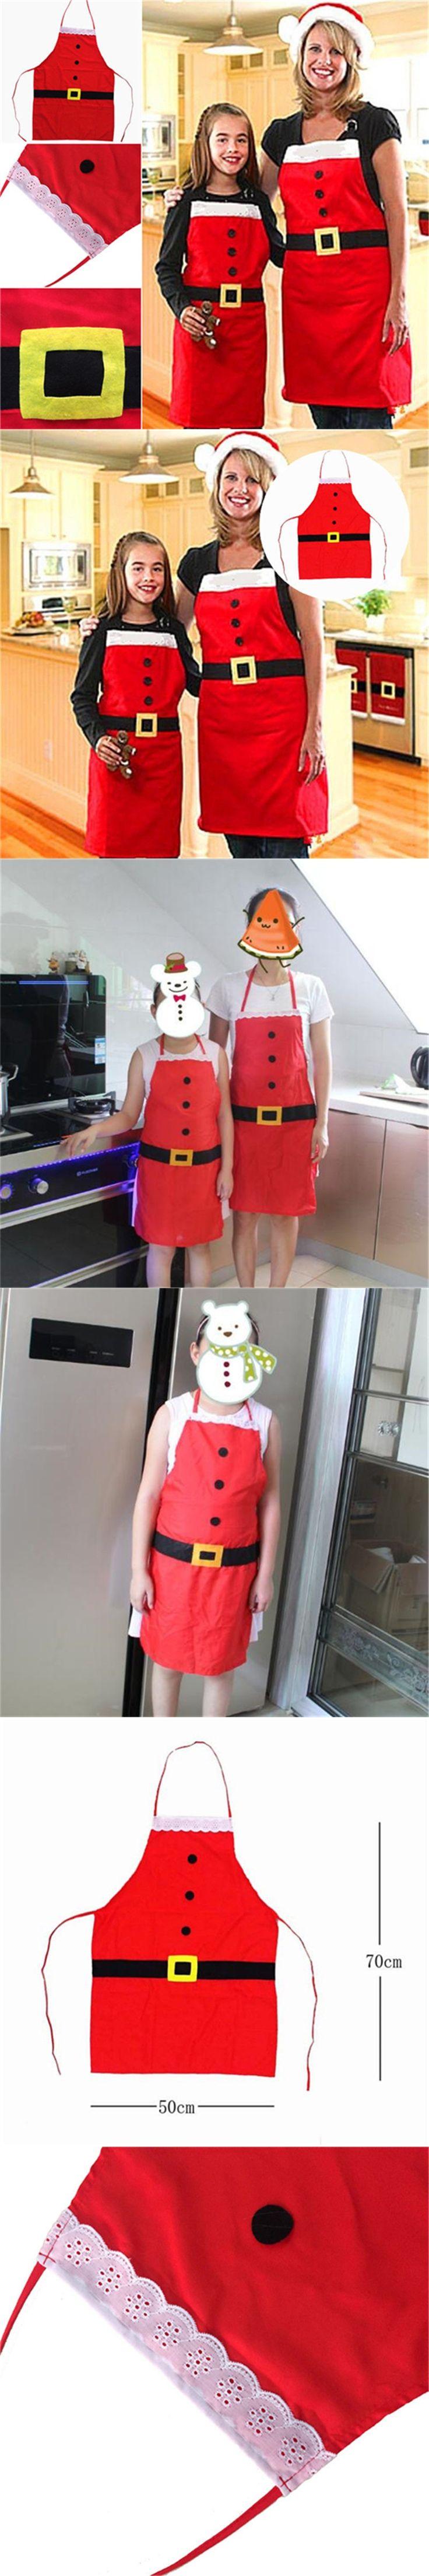 EatingBiting(R) Christmas Decoration Santa Apron Home Kitchen Cooking Baking Chef Red Apron